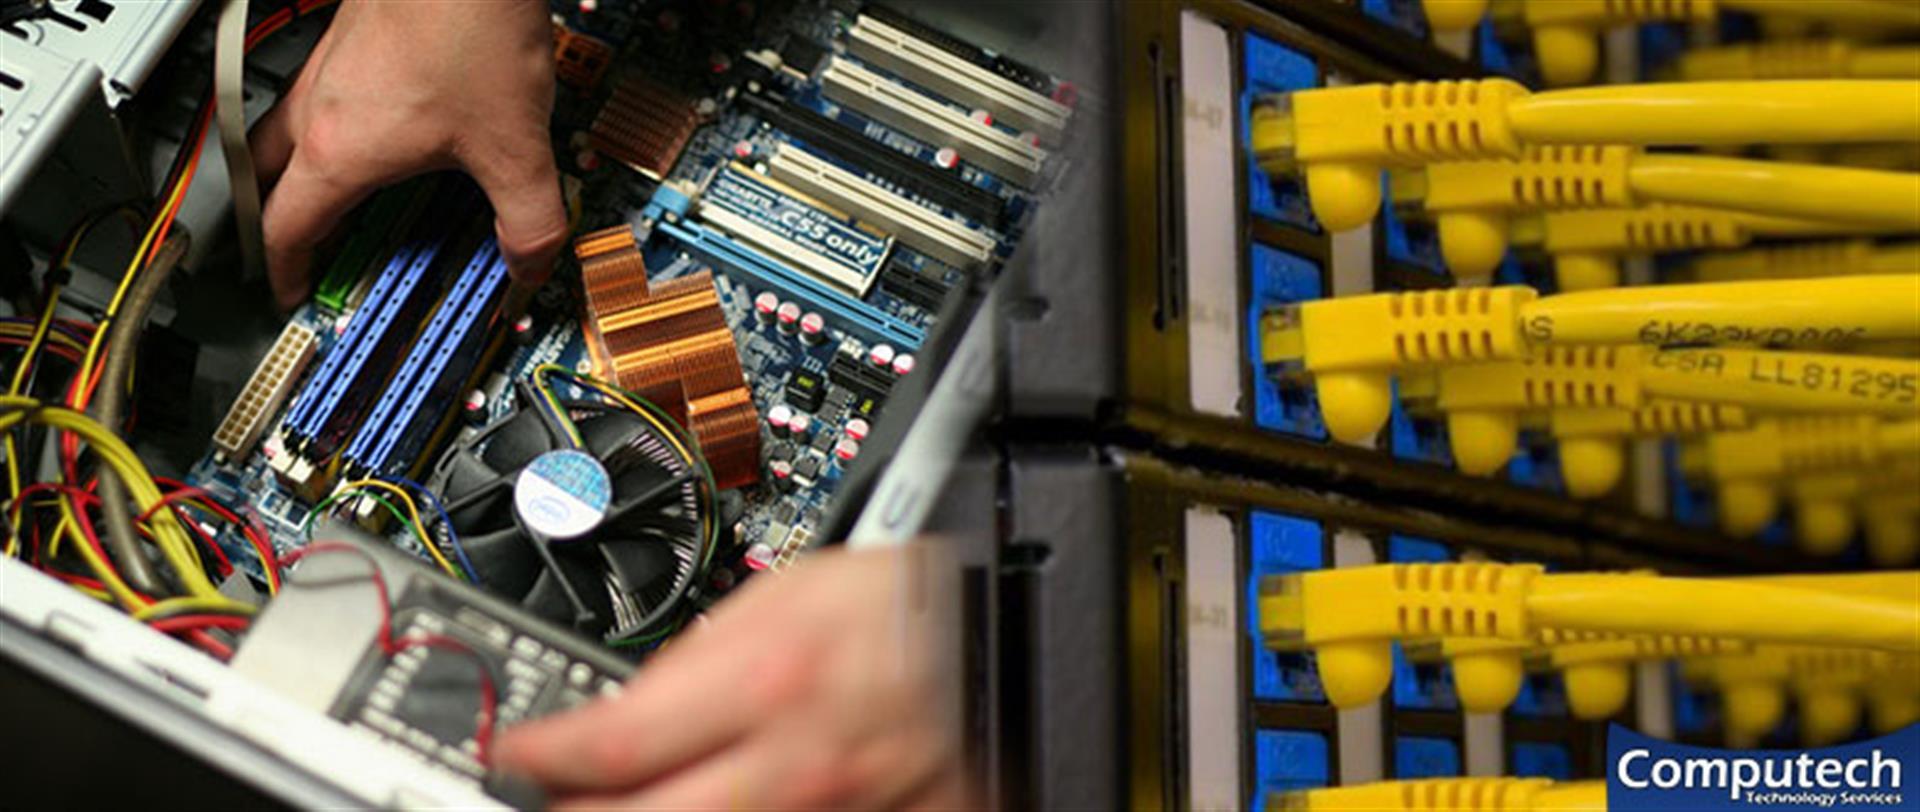 Pinson Alabama Onsite Computer & Printer Repair, Networking, Telecom & Data Wiring Solutions